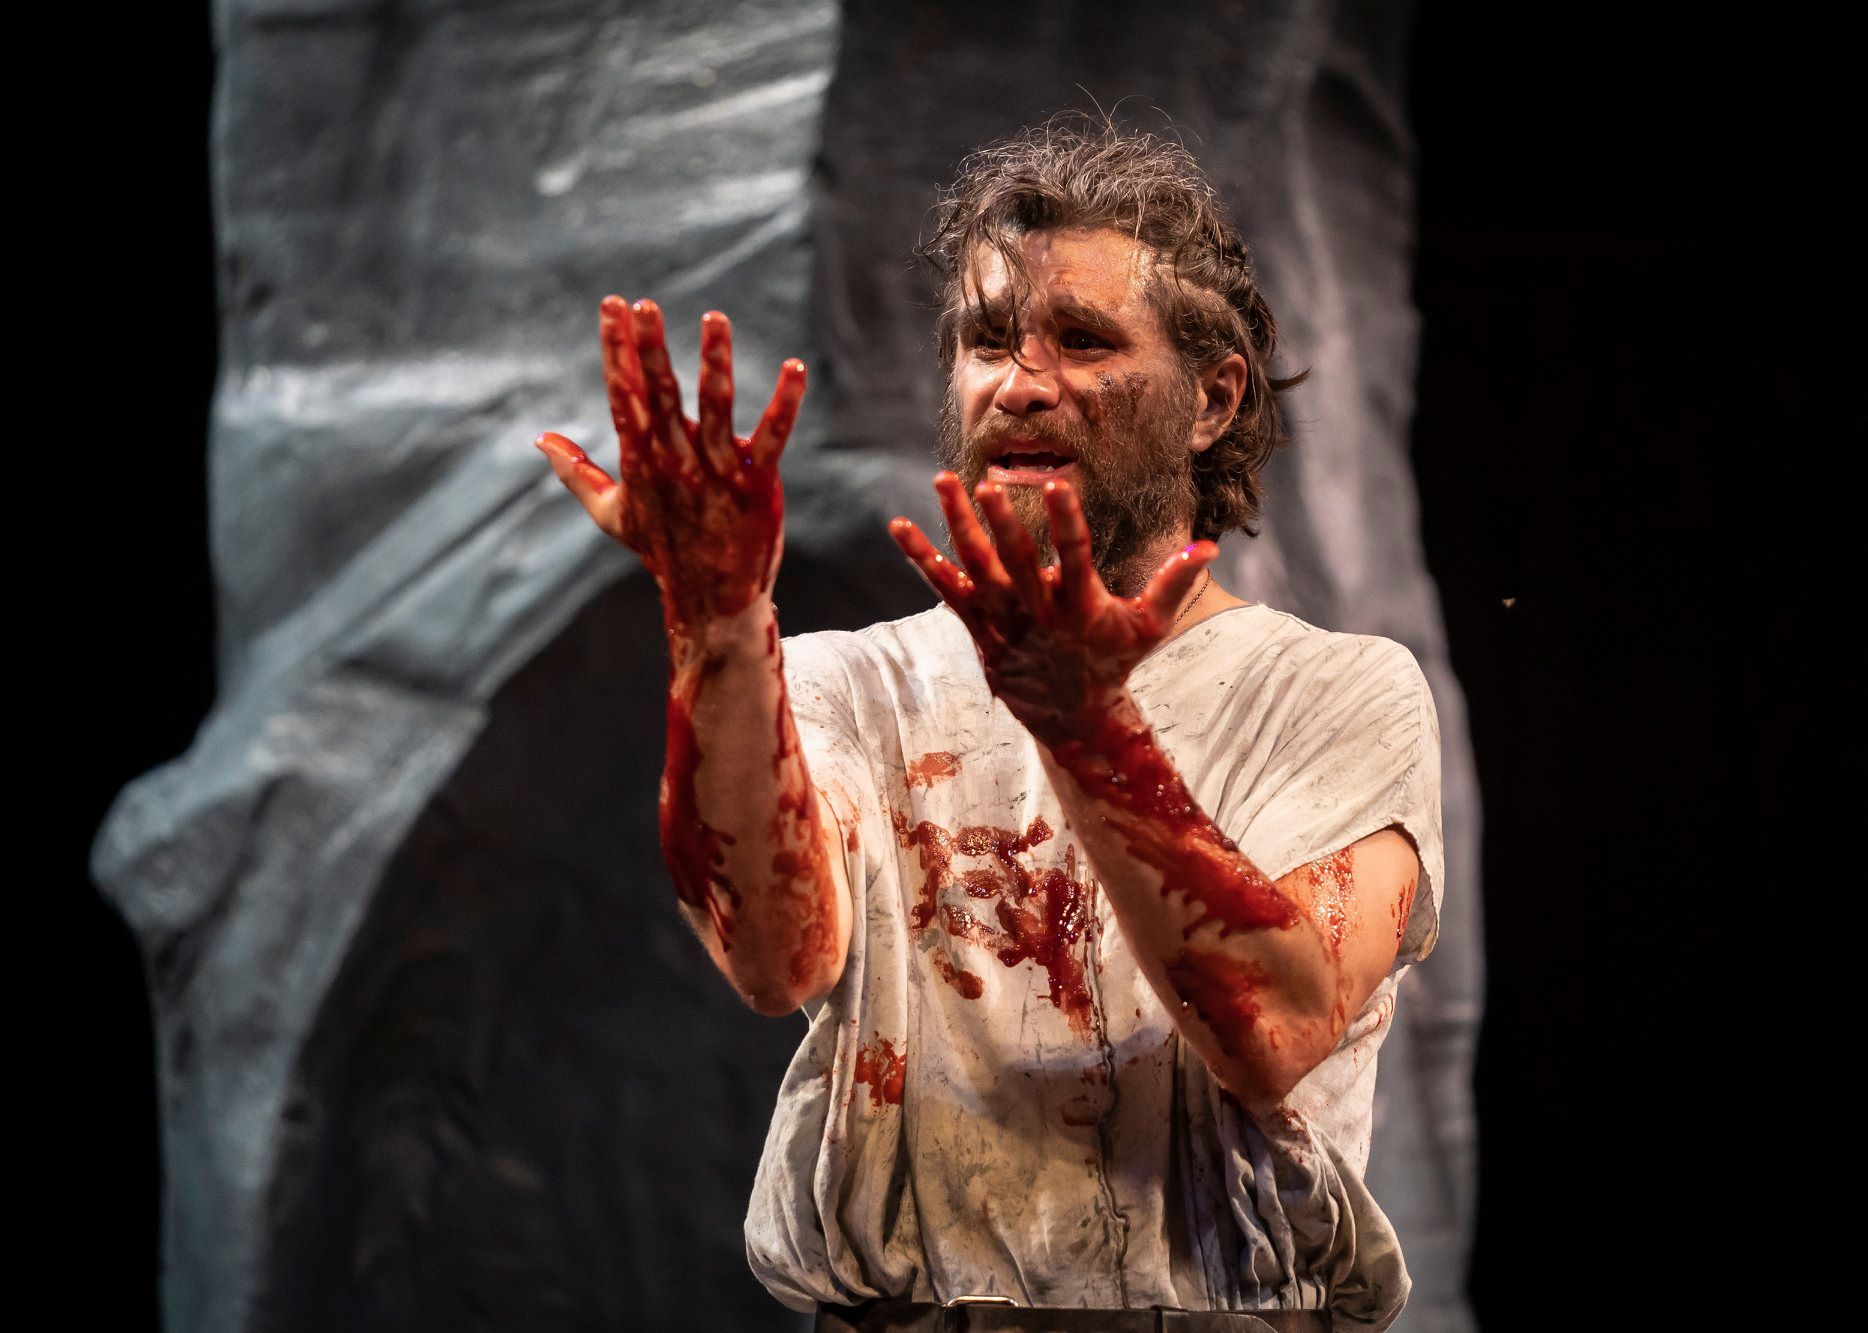 Marcus Truschinski as Macbeth. Photo by Liz Lauren.